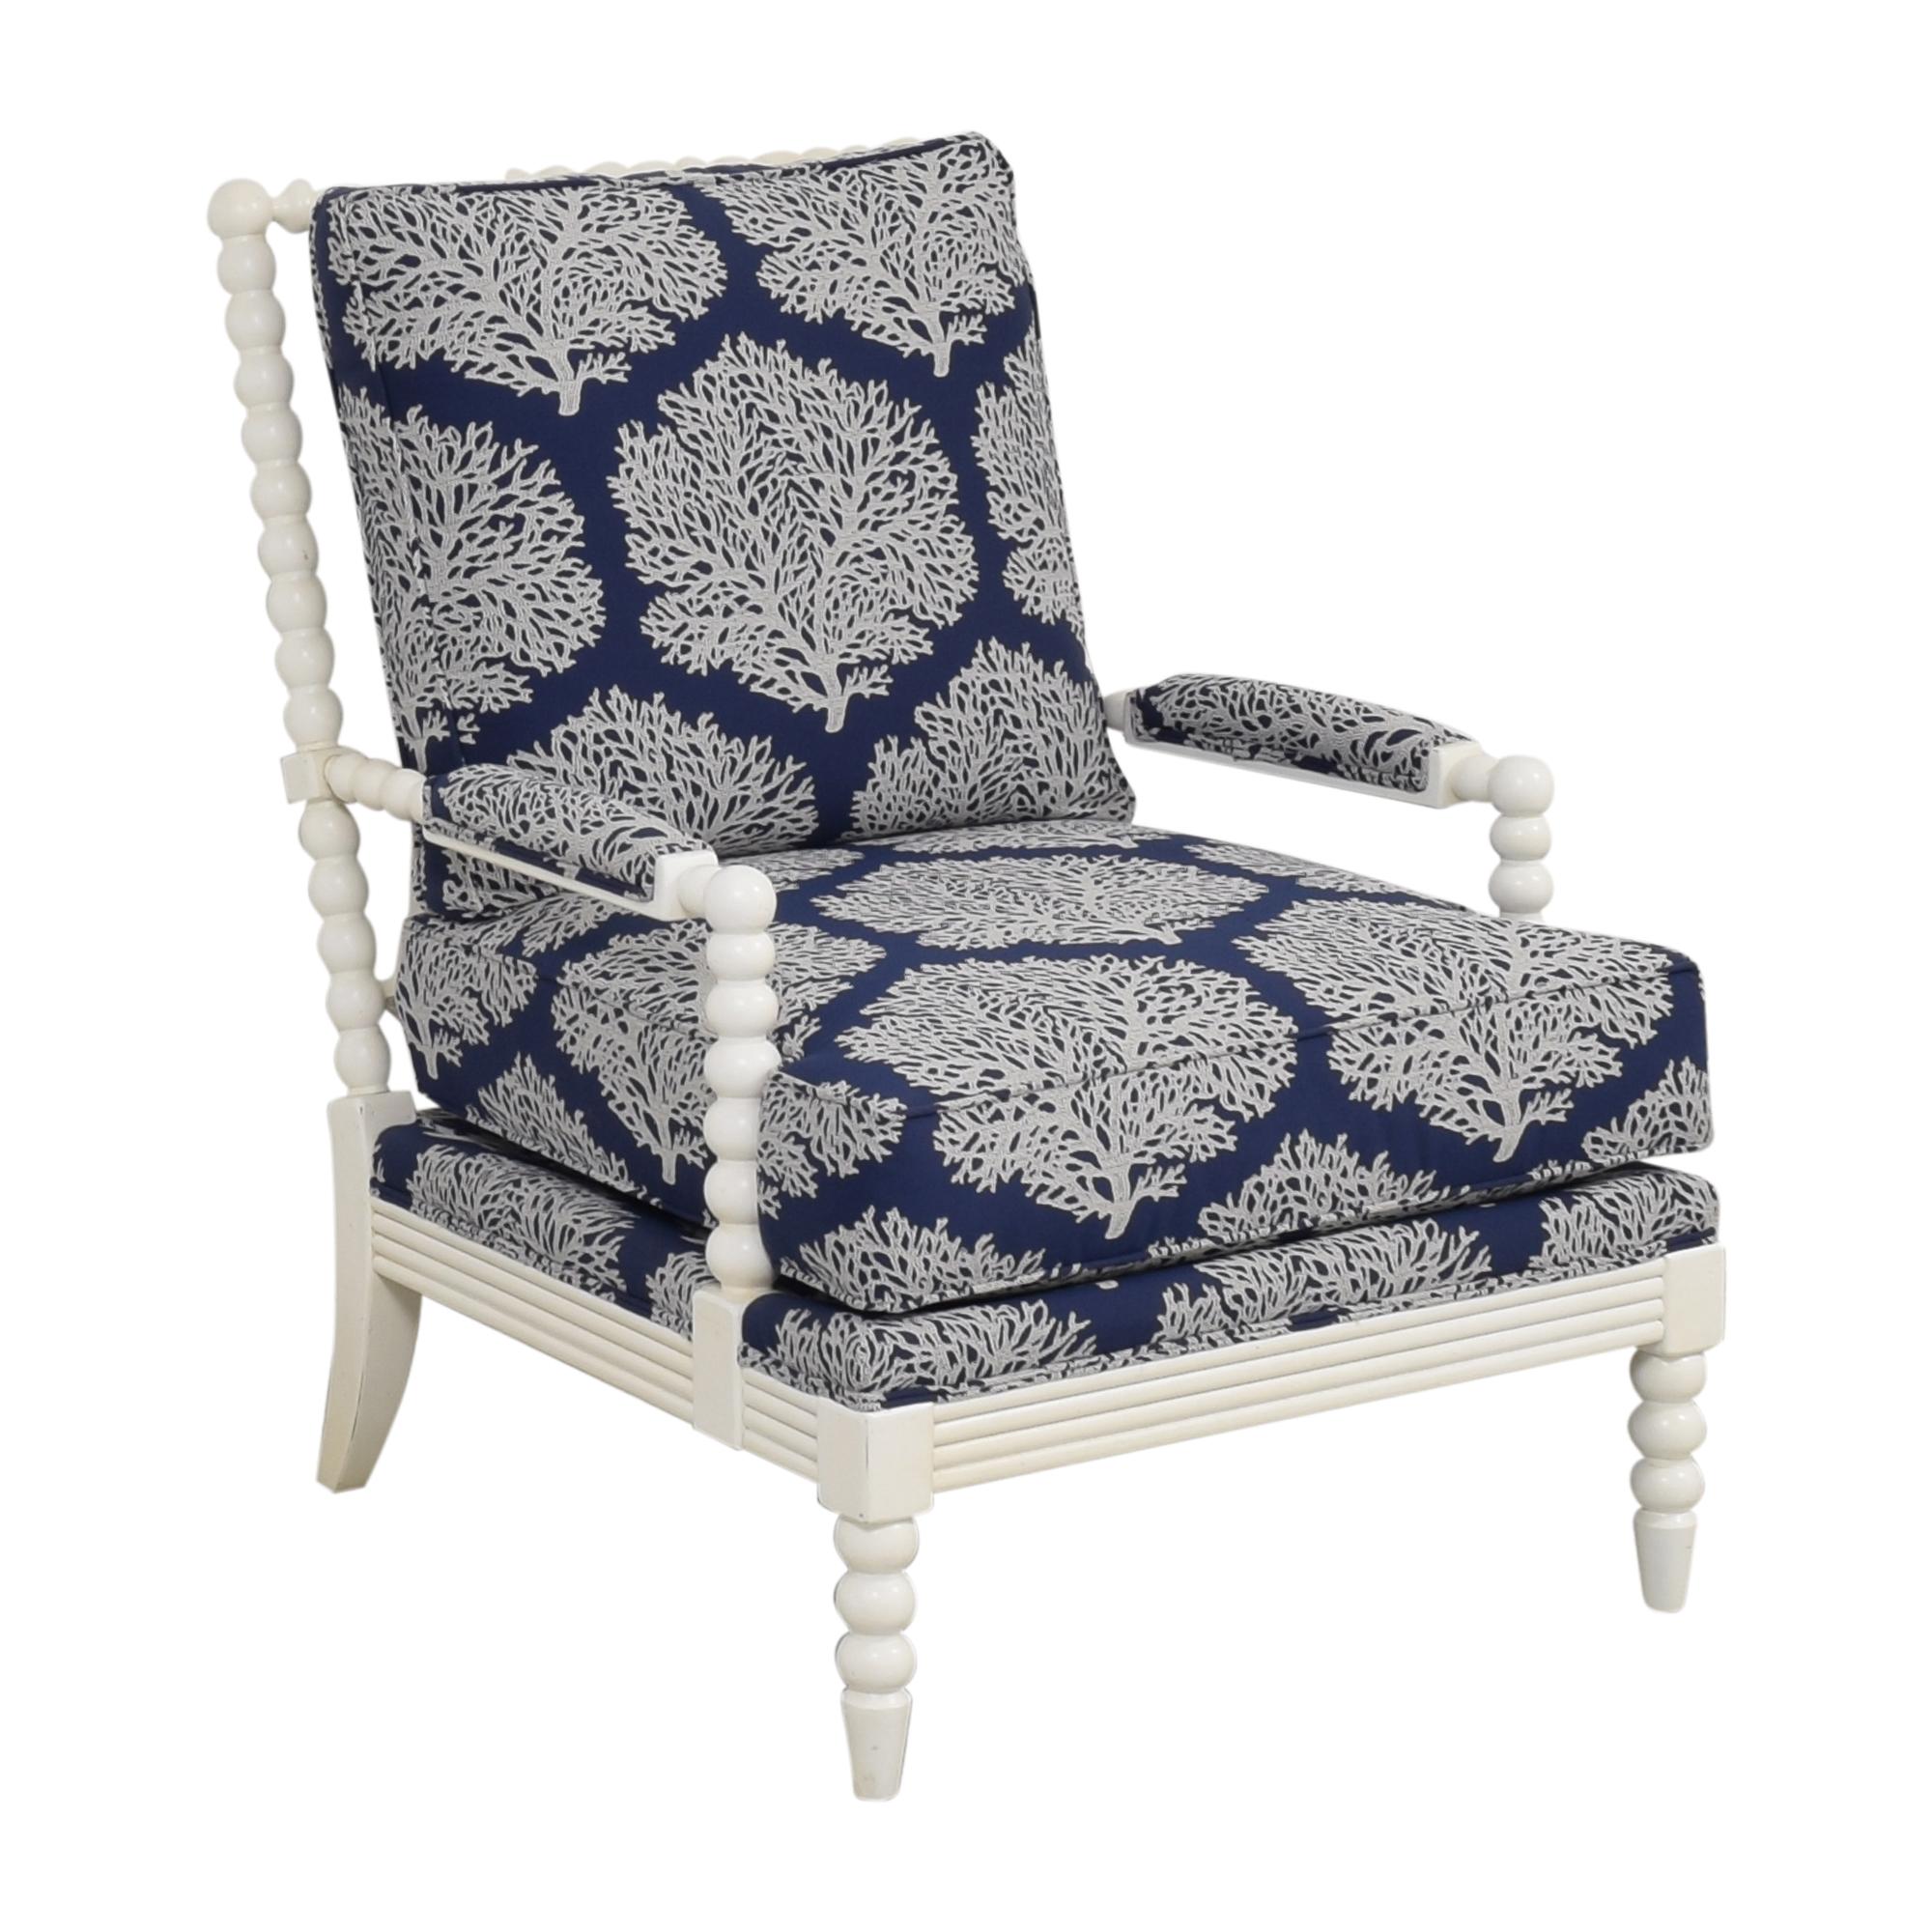 Ethan Allen Ethan Allen Custom Brandt Chair for sale